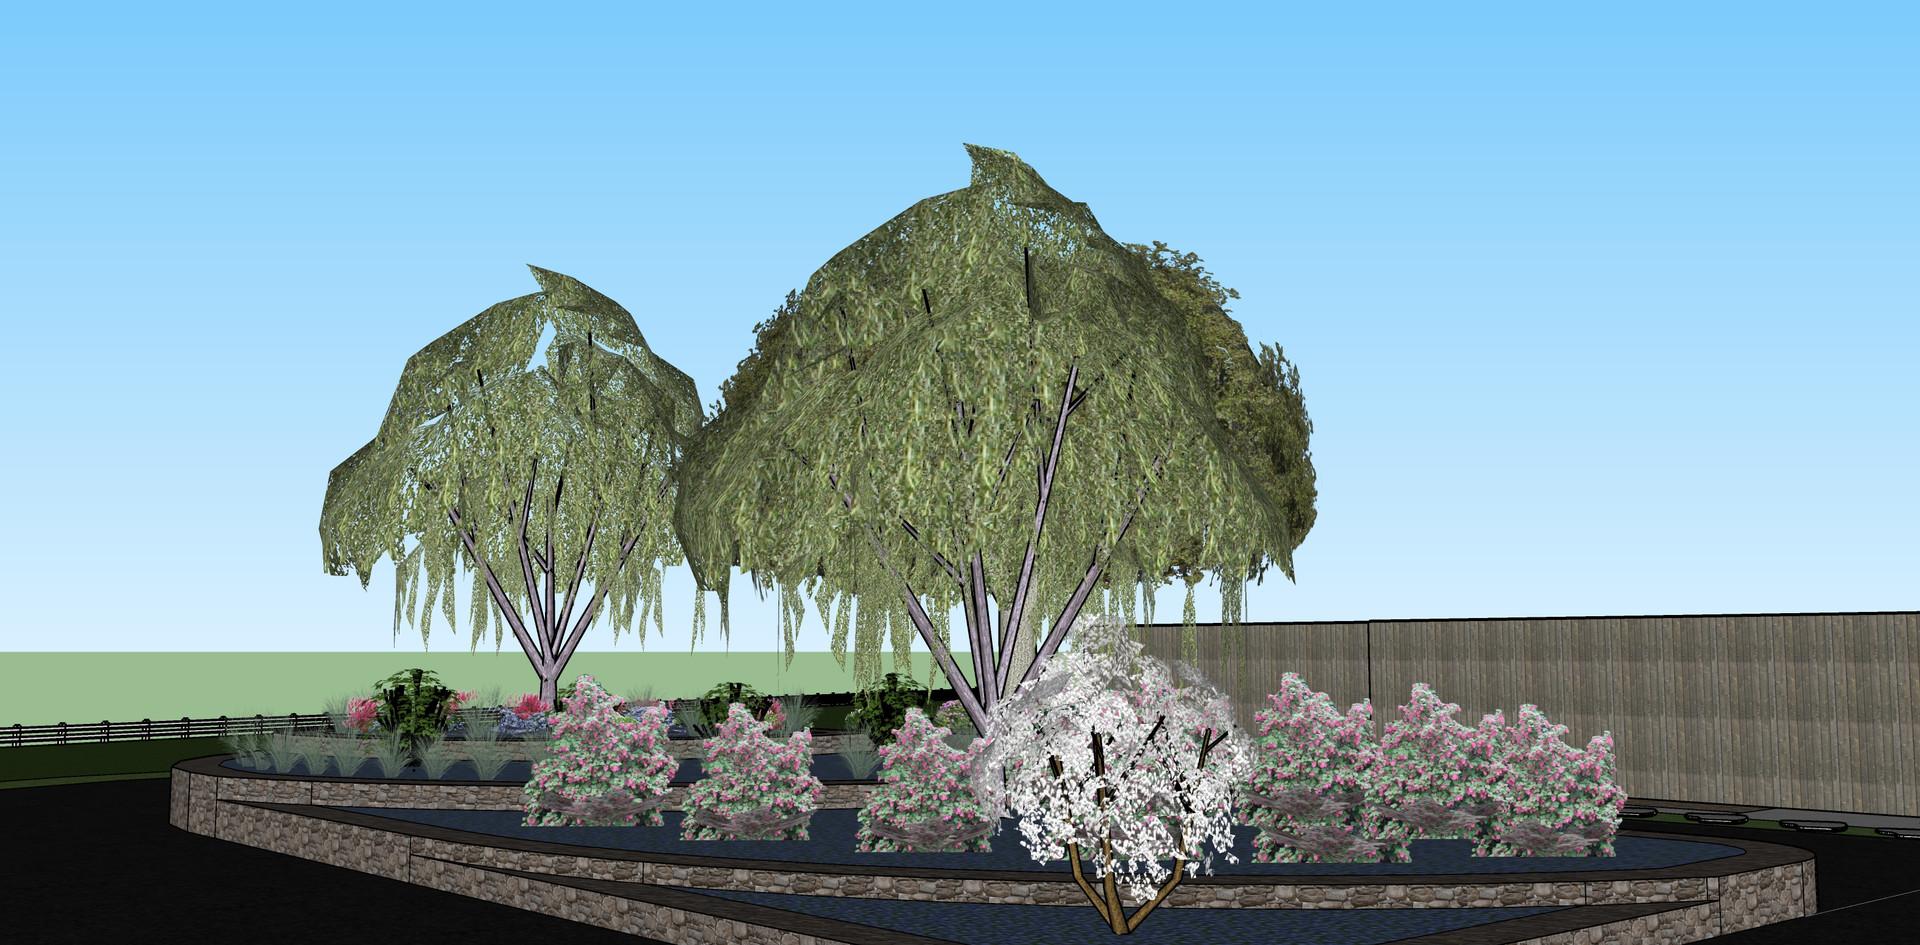 Cascading rain garden feature